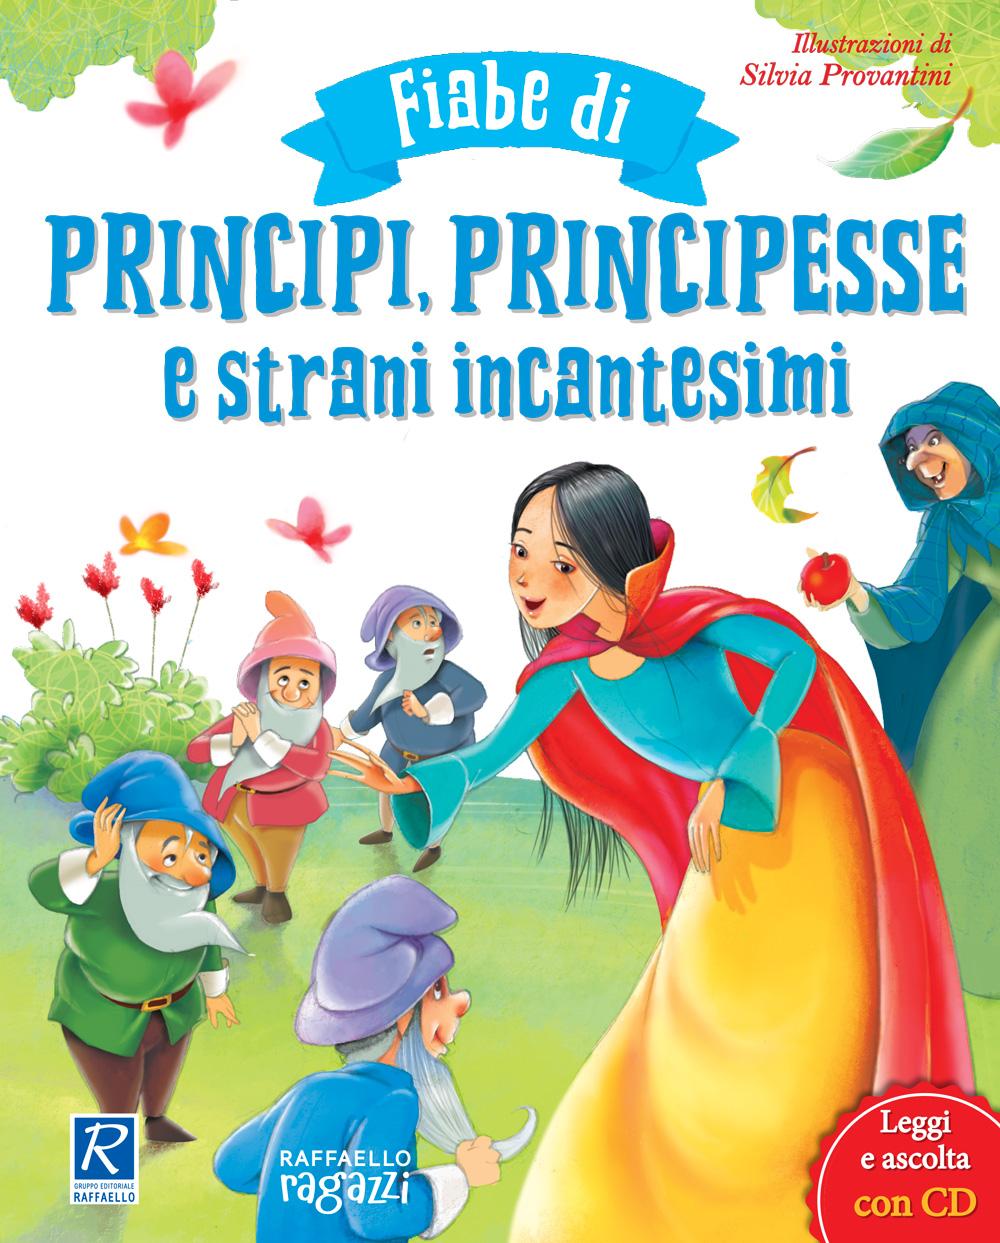 Fiabe di principi, principesse e strani incantesimi